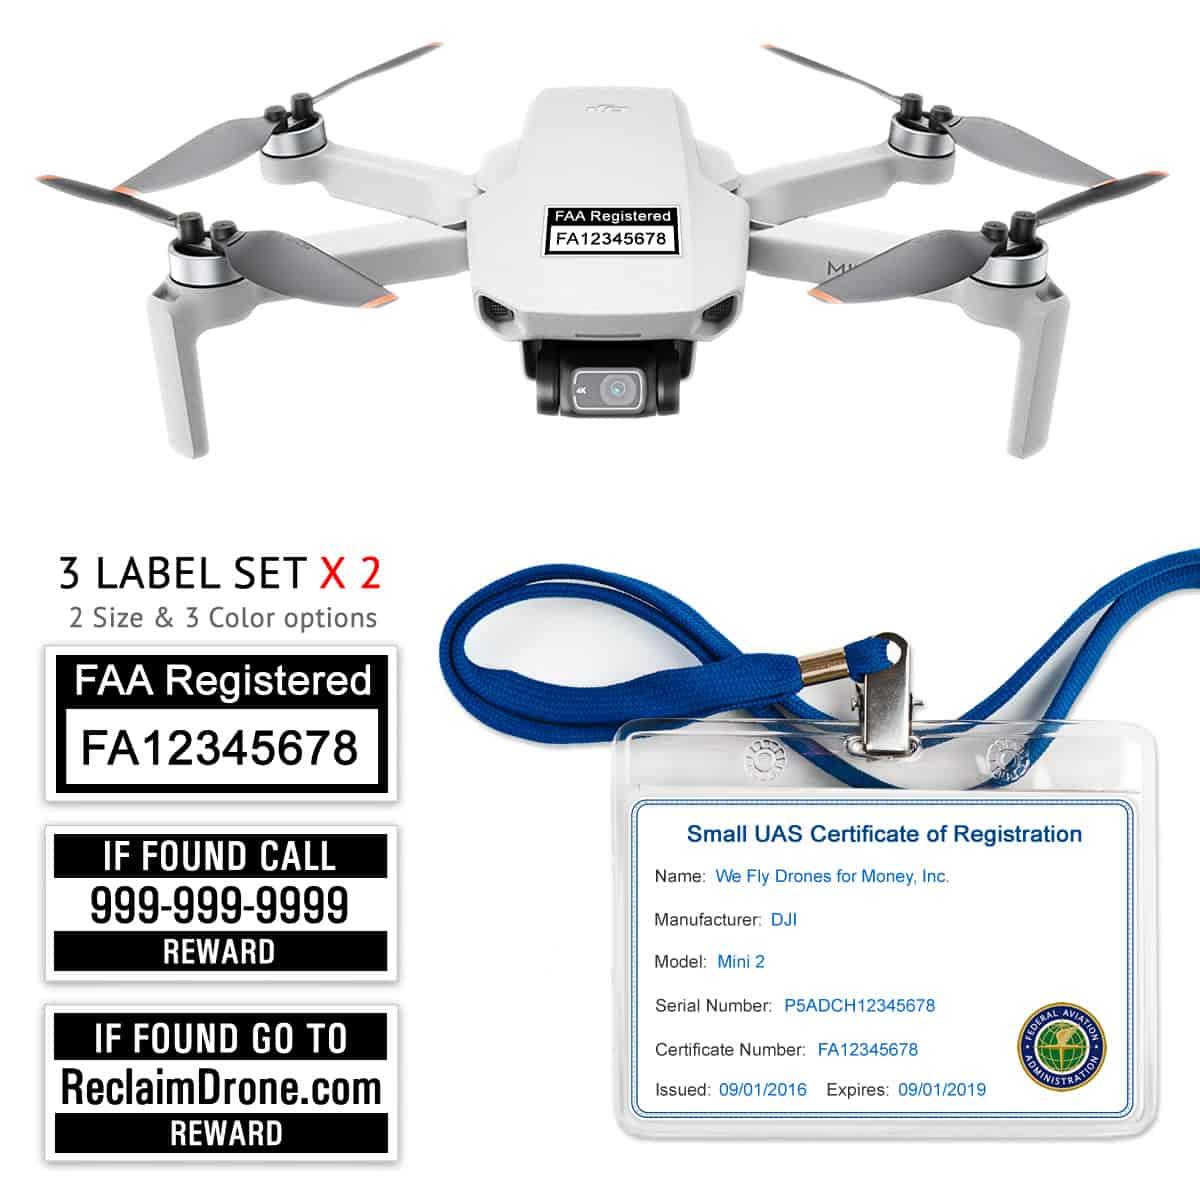 DJI Mini 2 – FAA Registration Commercial Pilot Bundle – FAA Labels, ID Card, Lanyard